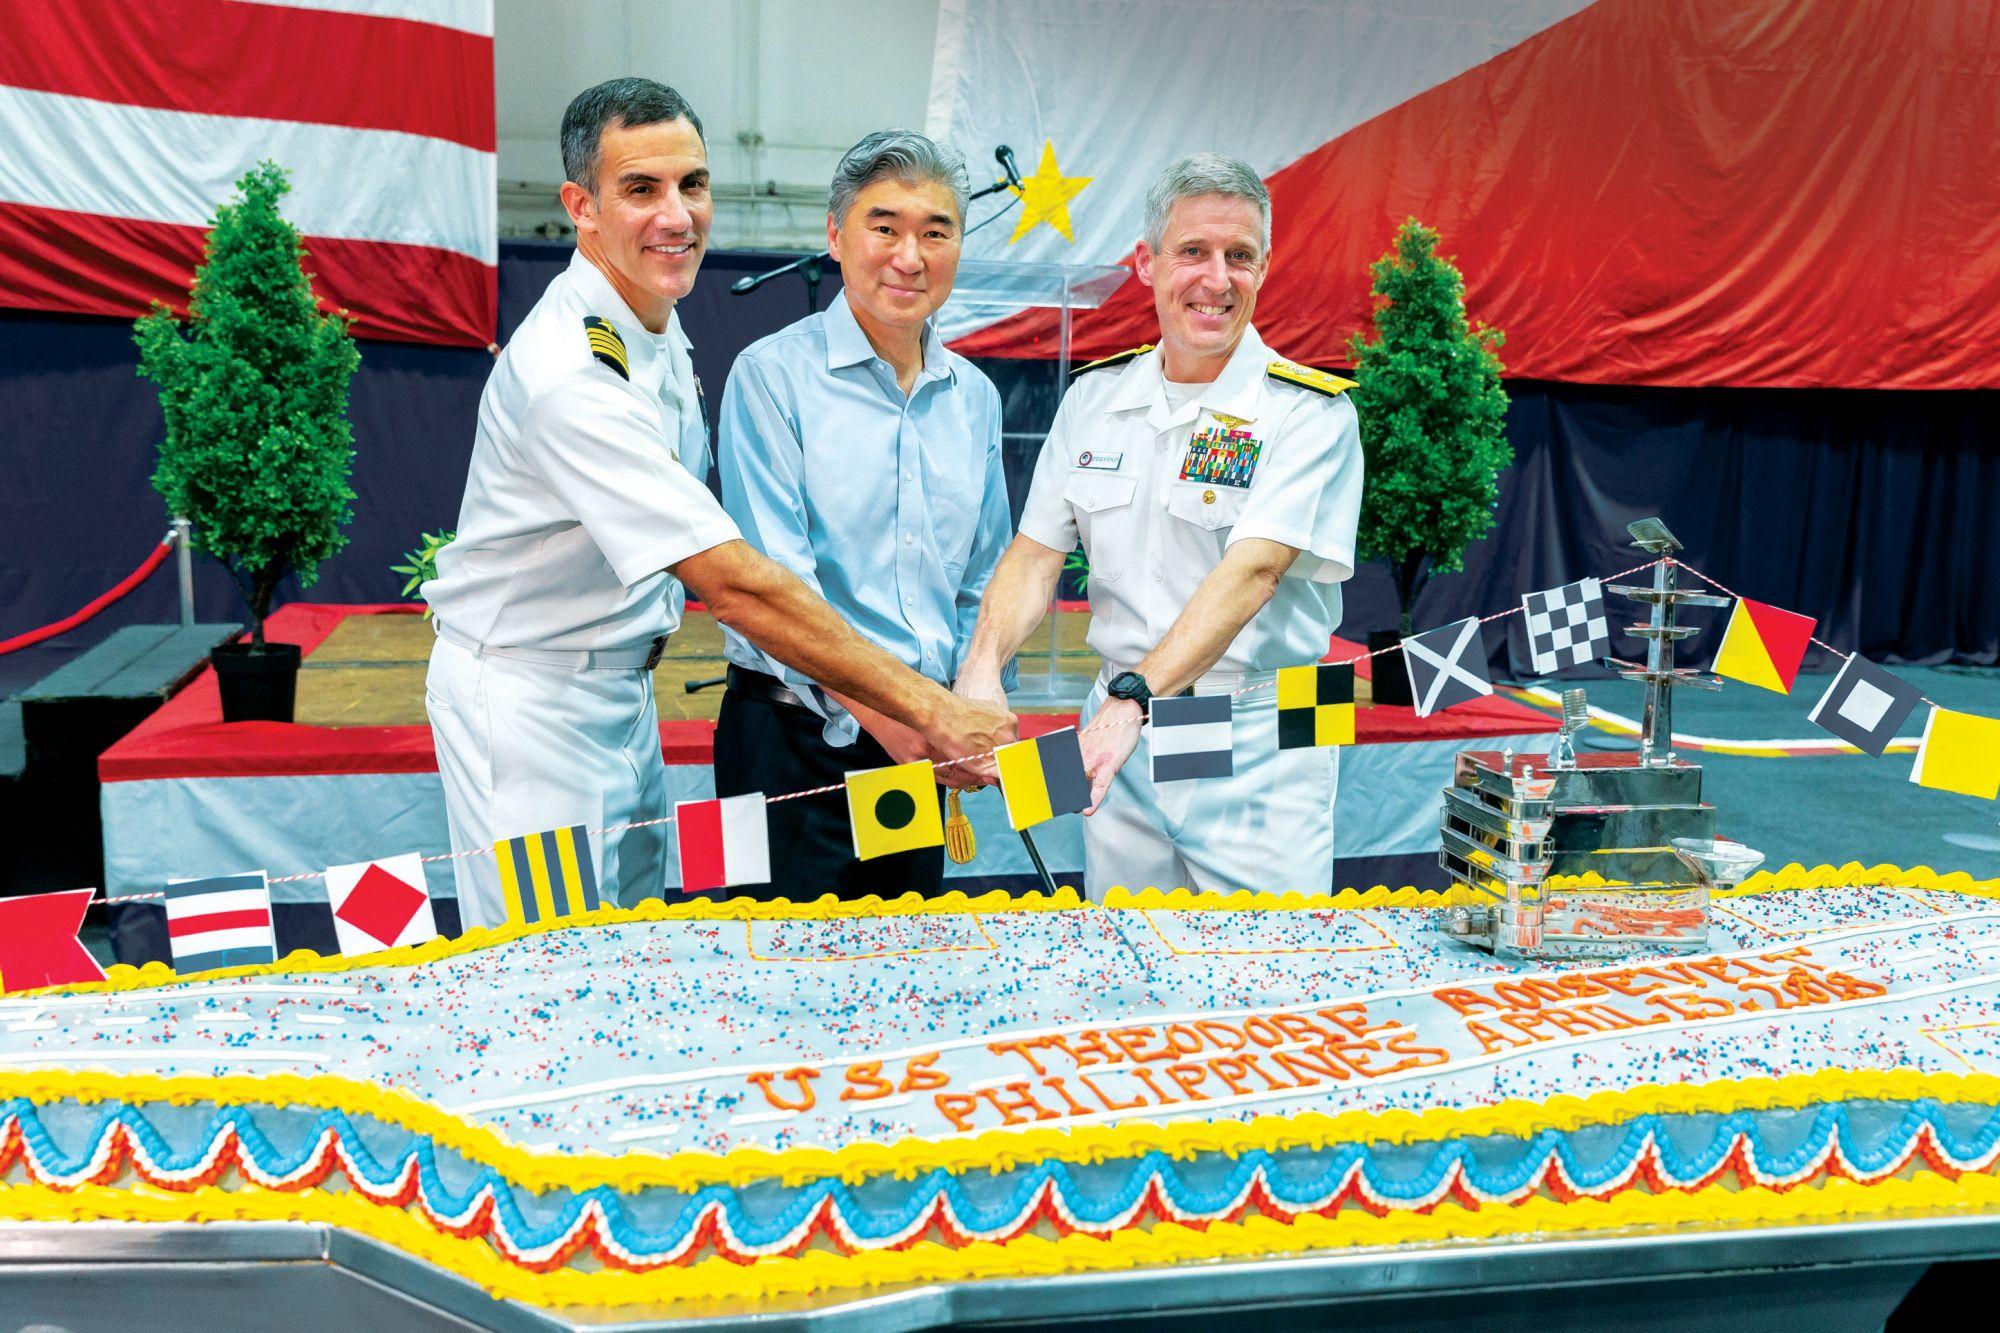 Captain Carlos Sardiello, Ambassador Sung Kim, and Rear Admiral Steve Koehler